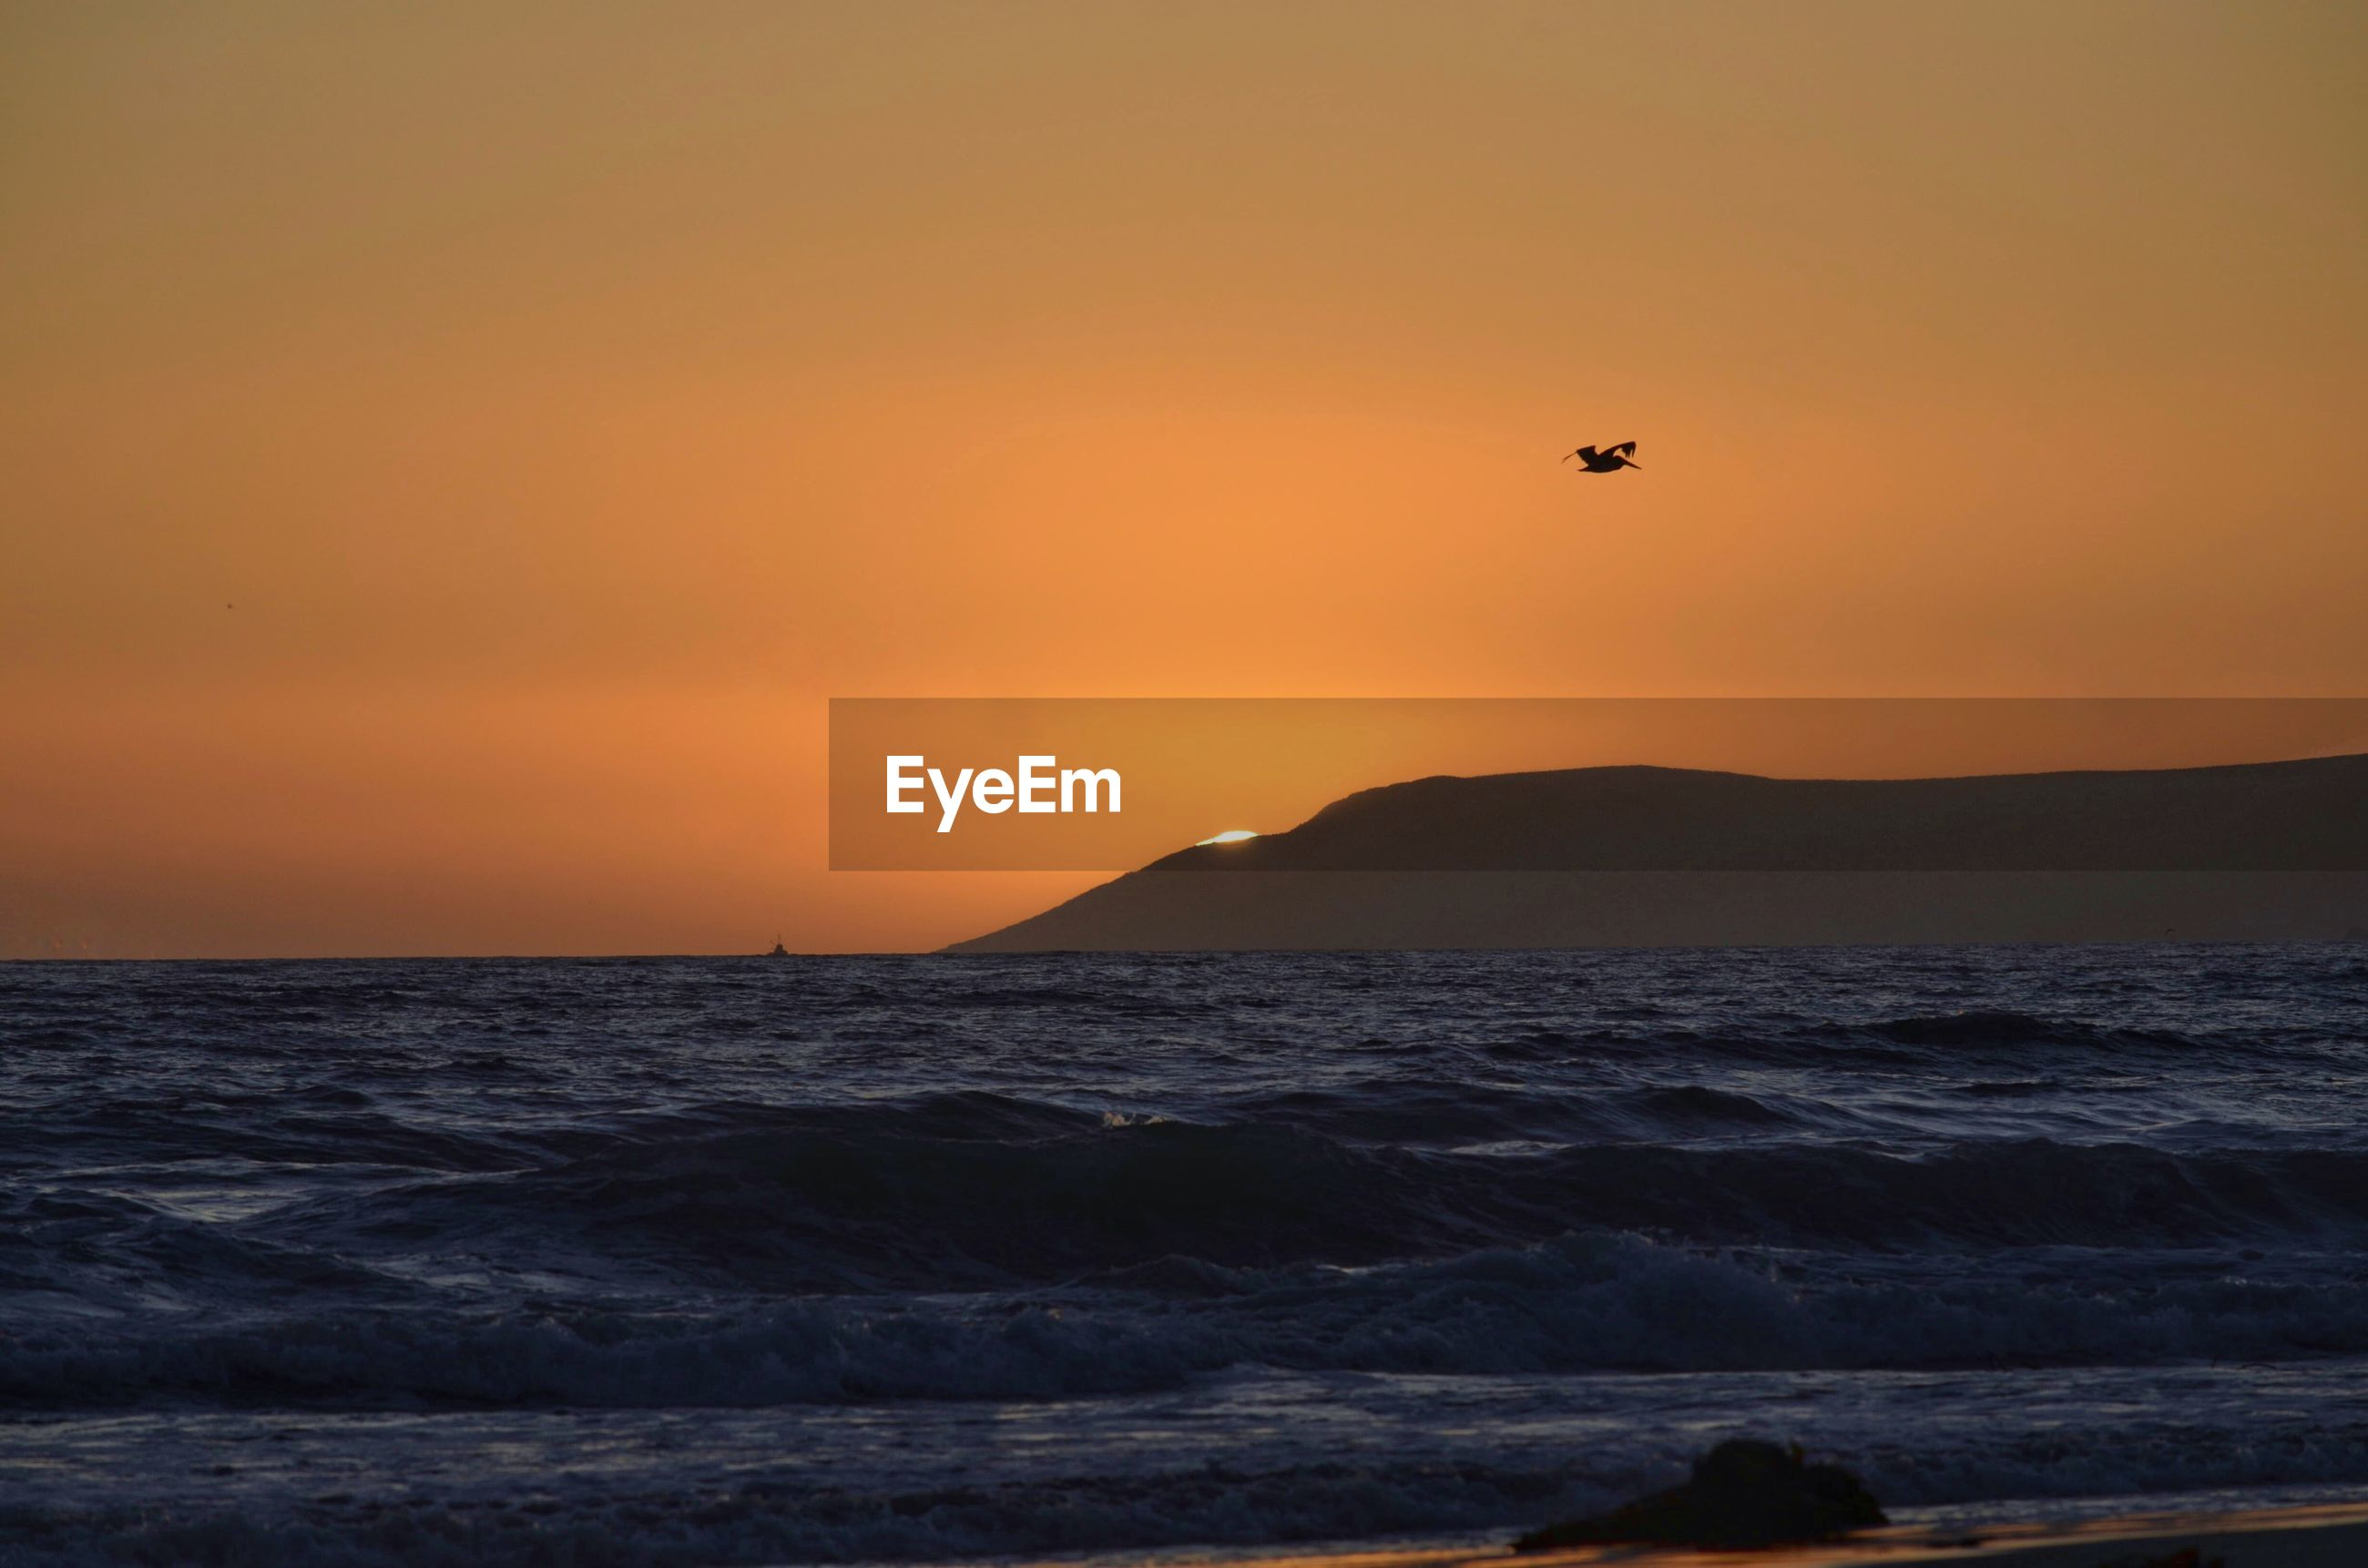 Silhouette bird flying over sea against orange sky during sunset